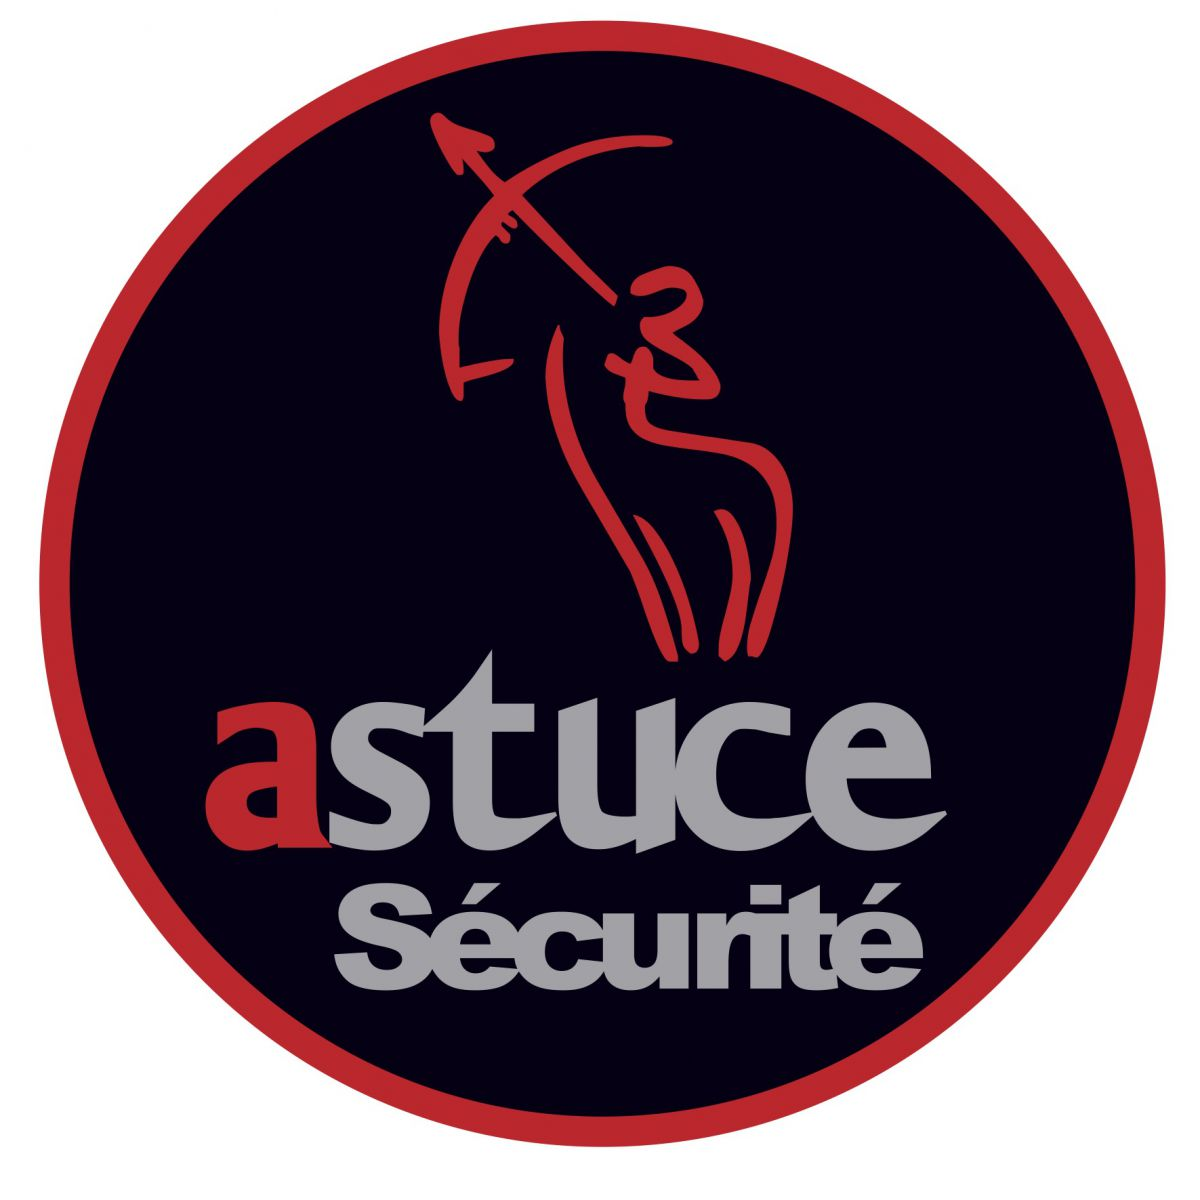 logo_astuce.jpg